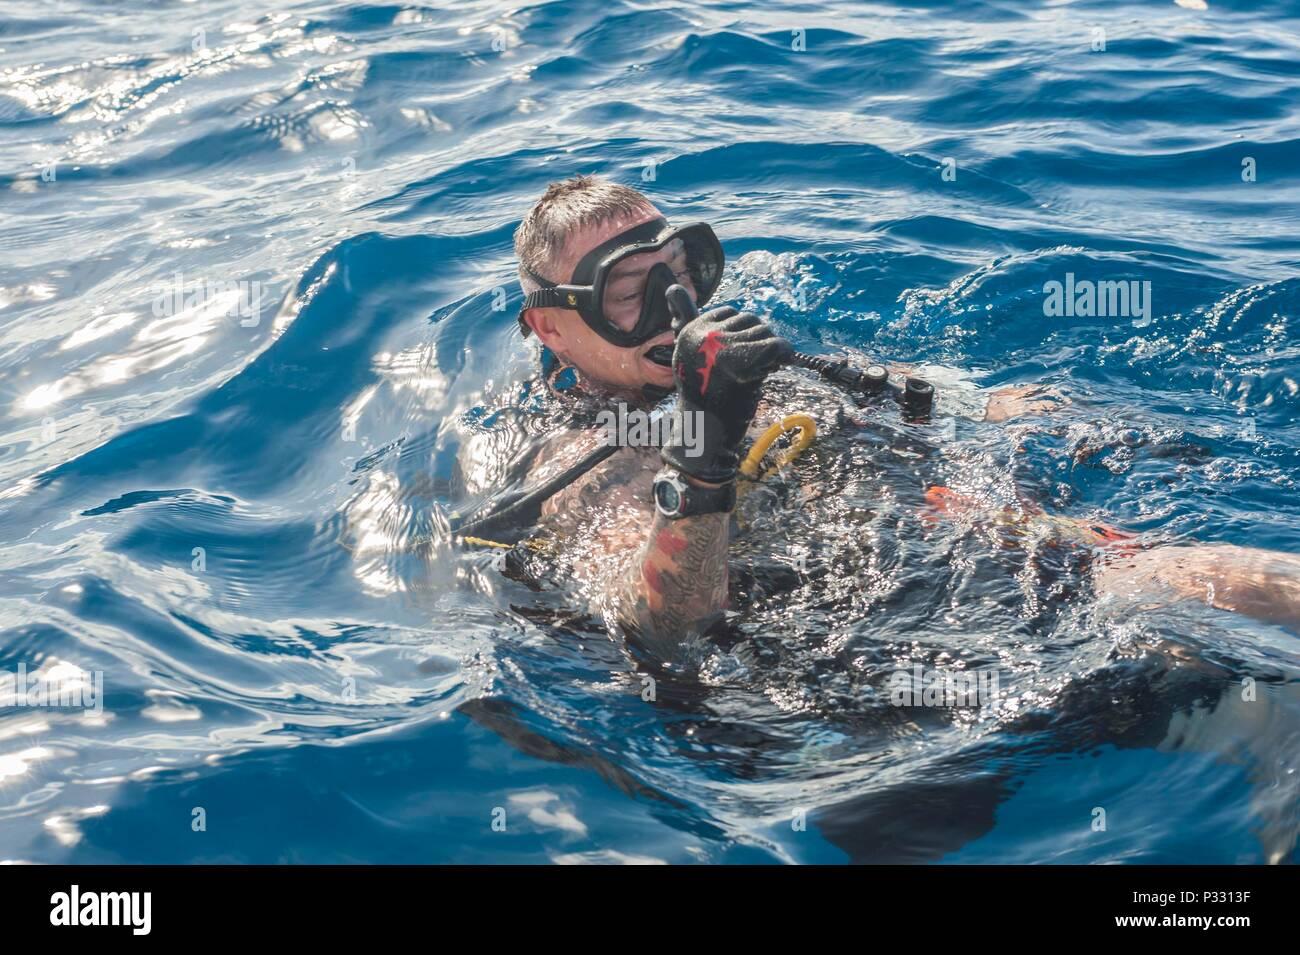 Live Kwajalein Atoll